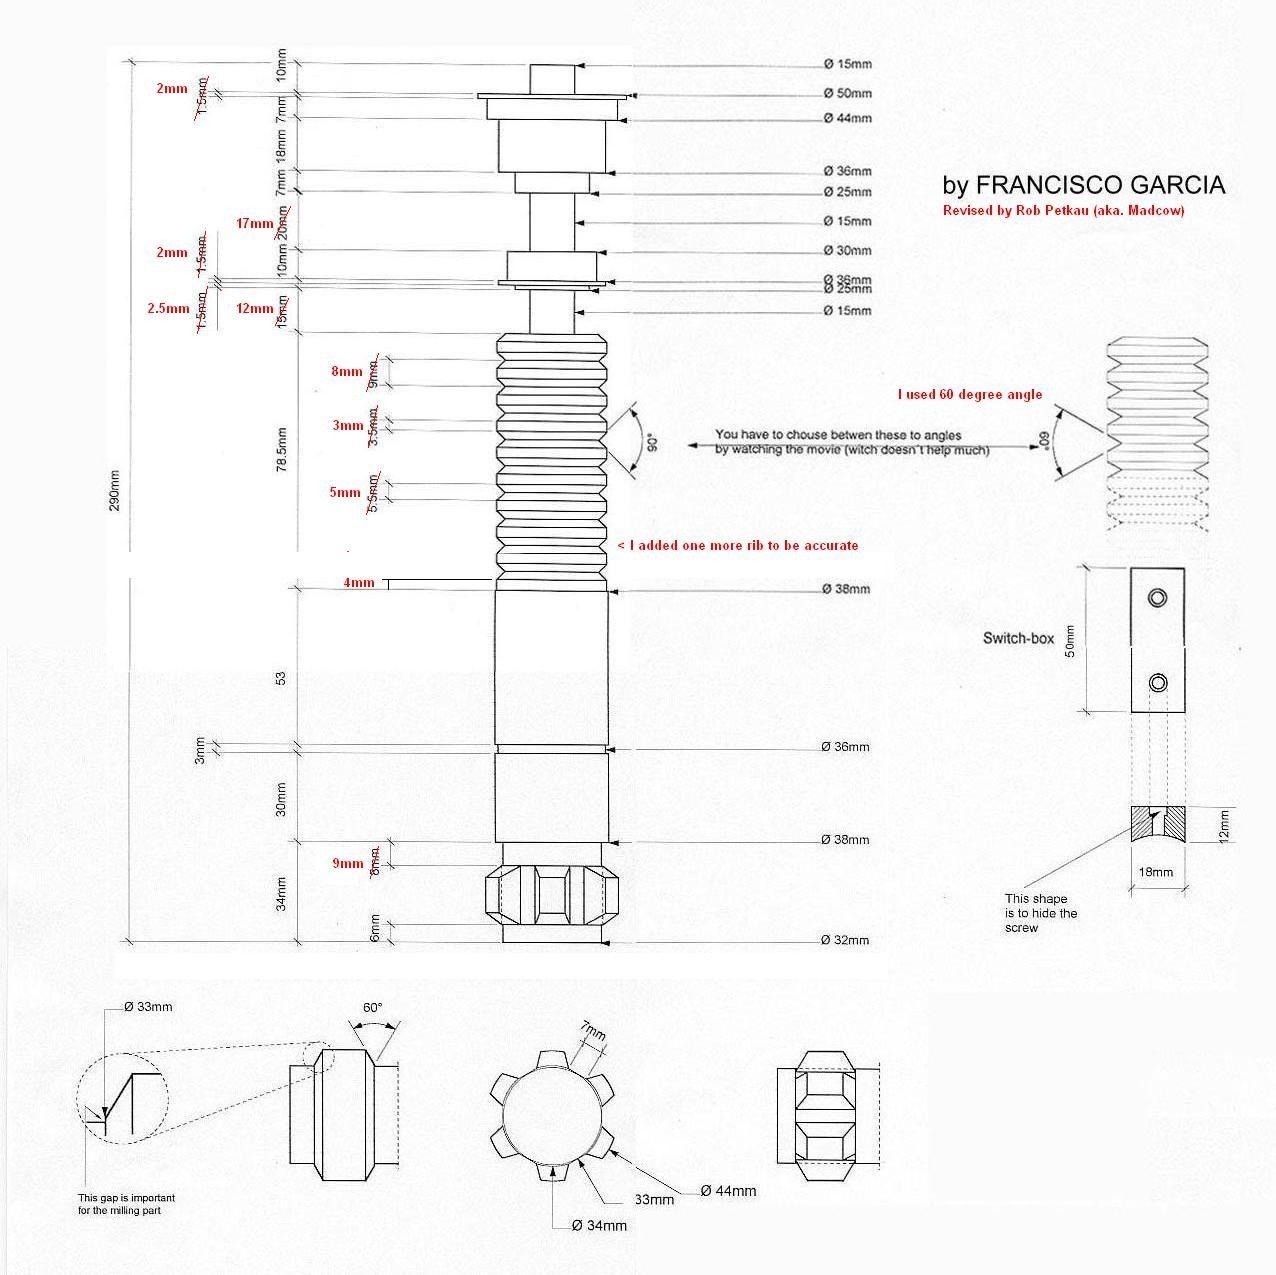 Lightsaber schematics. | Lightsabers | Star wars light saber ... on